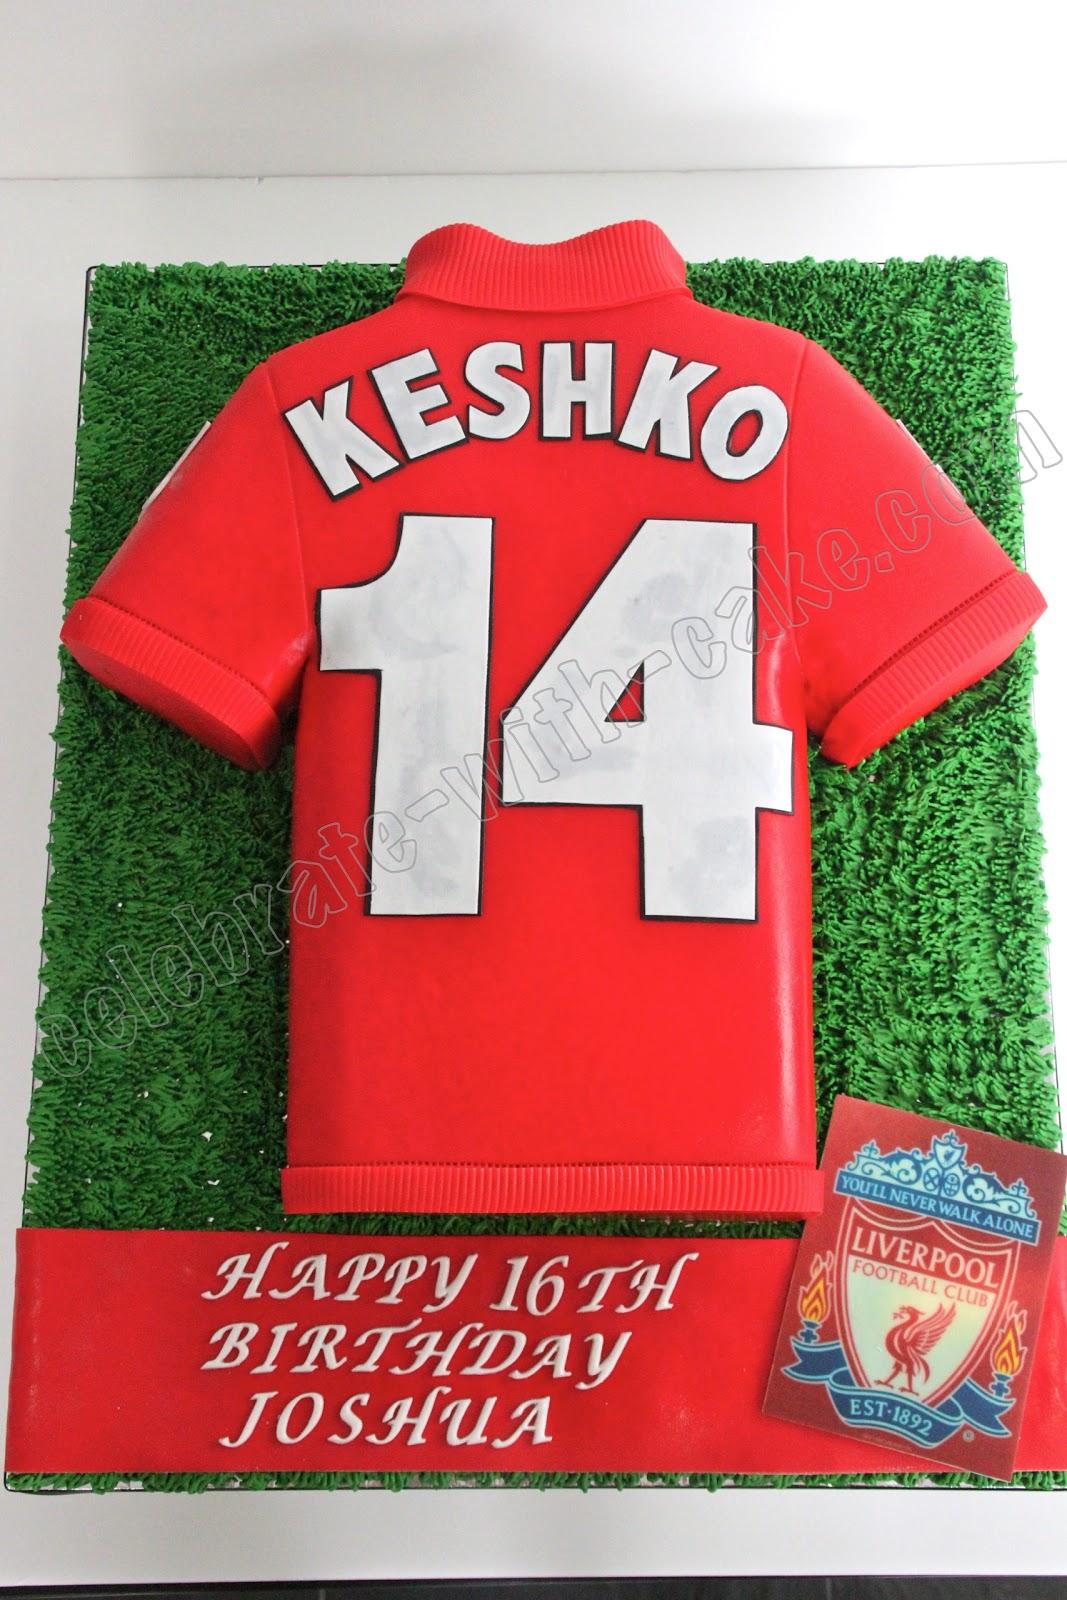 Celebrate with Cake!: Liverpool Jersey Cake